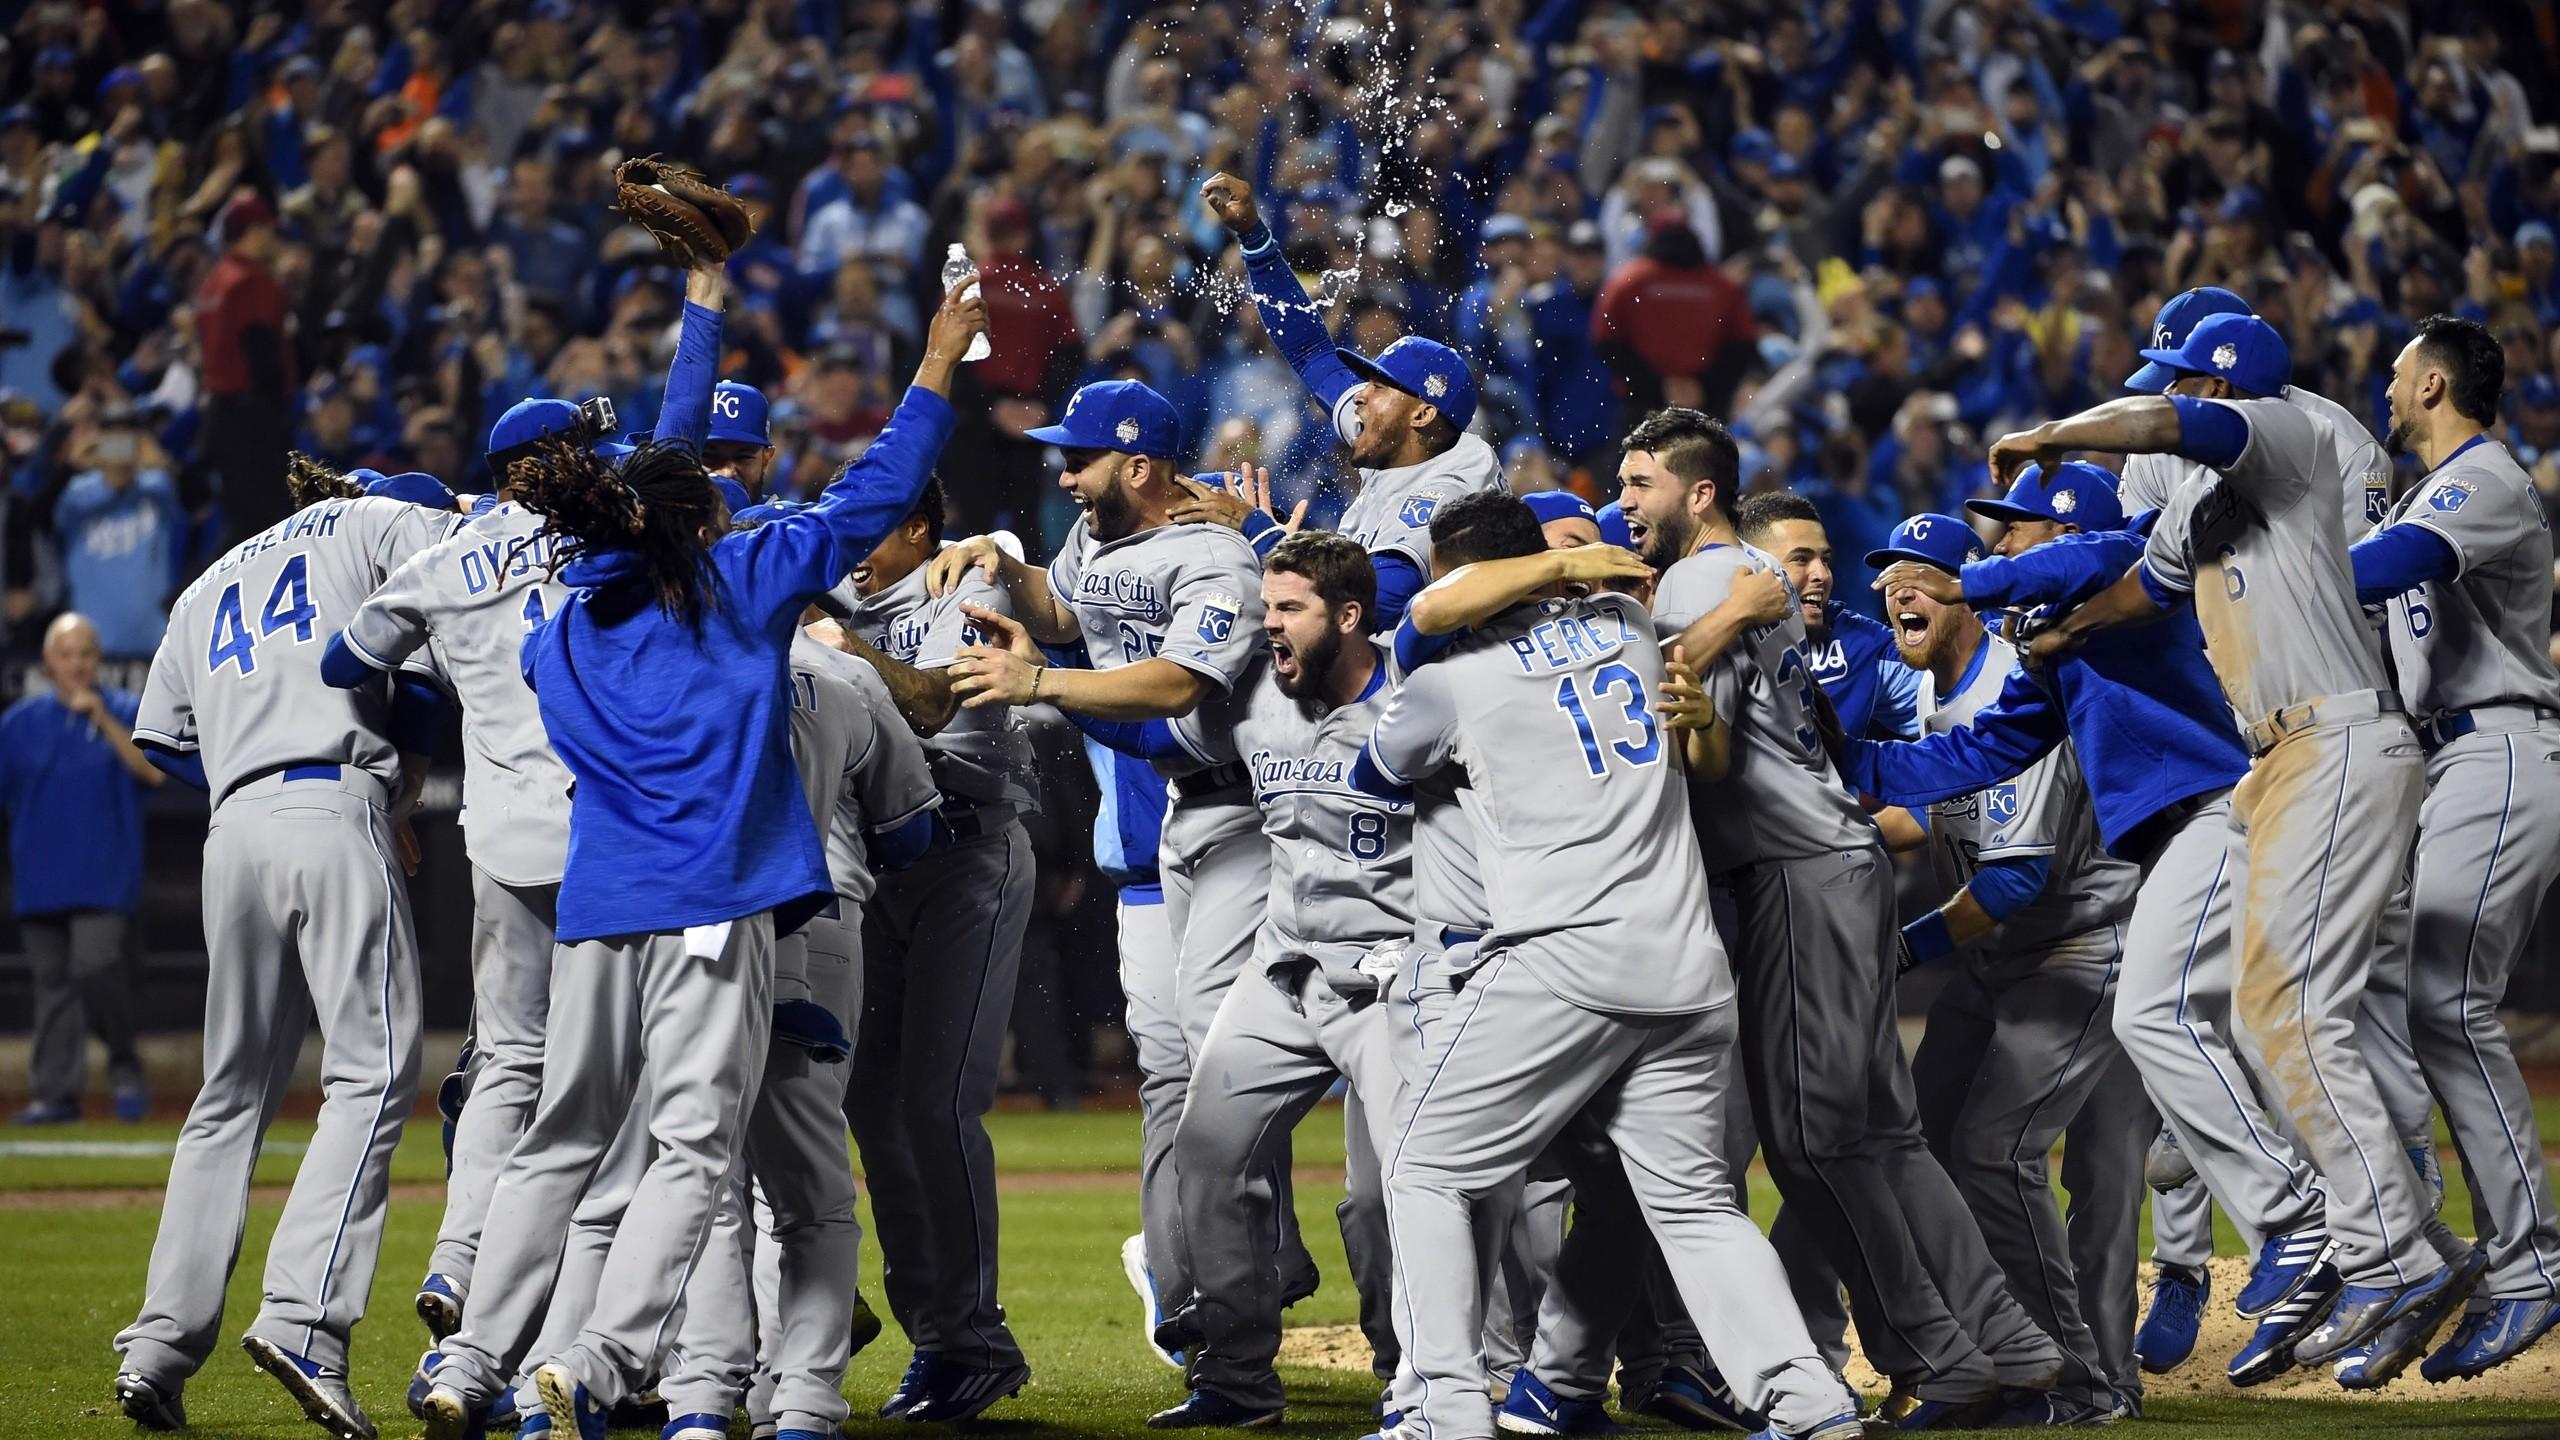 Kansas City Royals, Mlb, Sports, Kansas City Royals Team Champions  Celebrations, Baseball